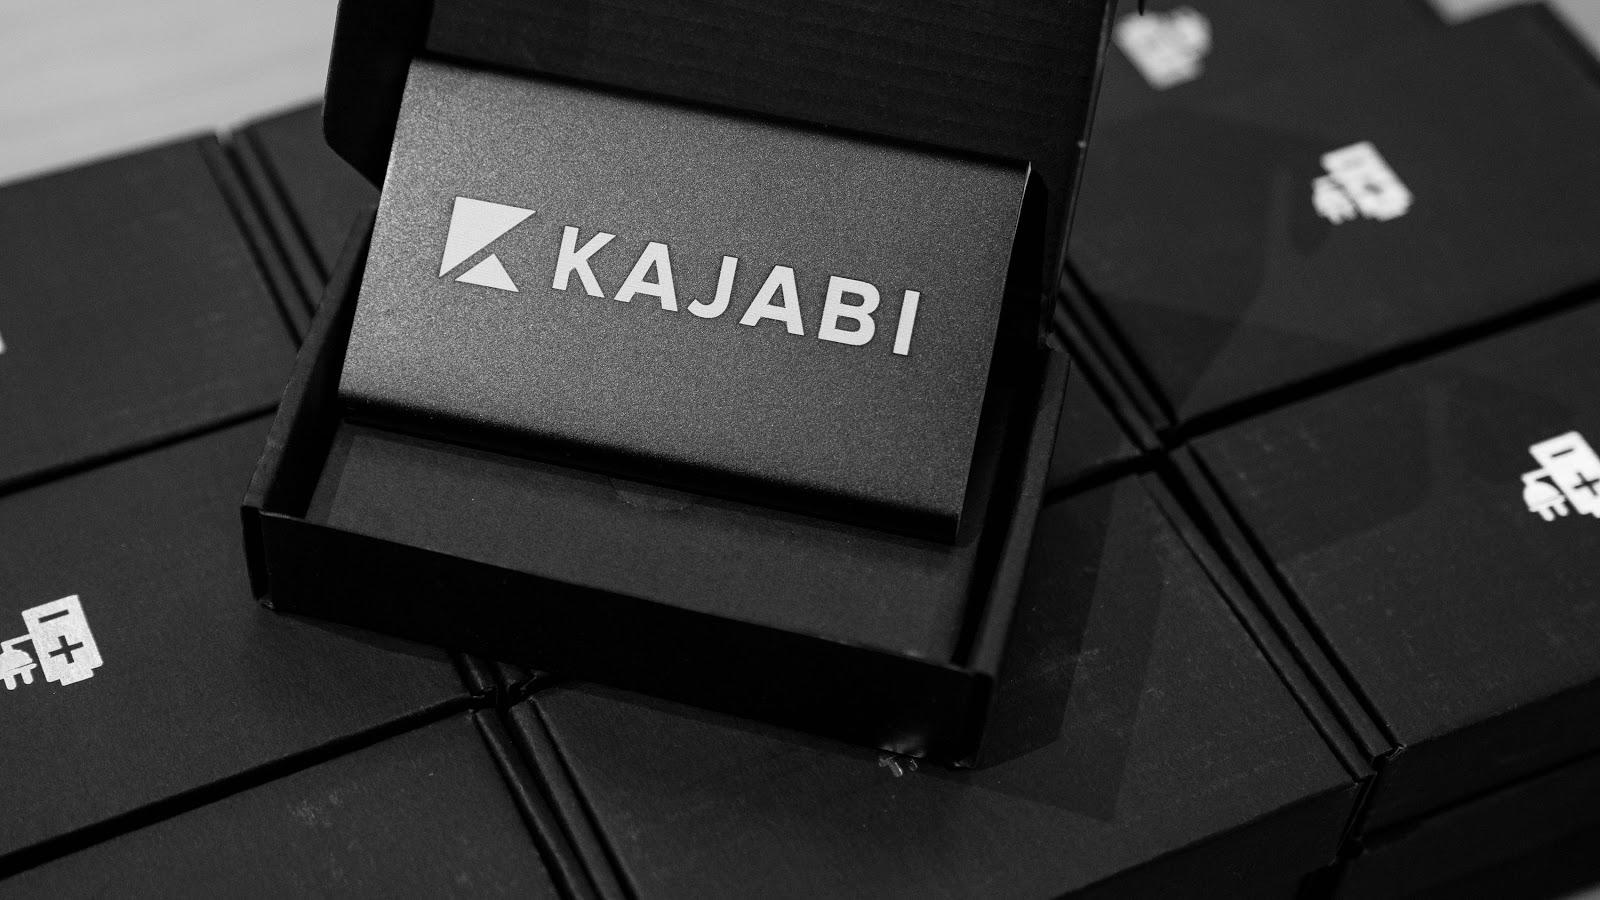 Kajabi logo on a business card